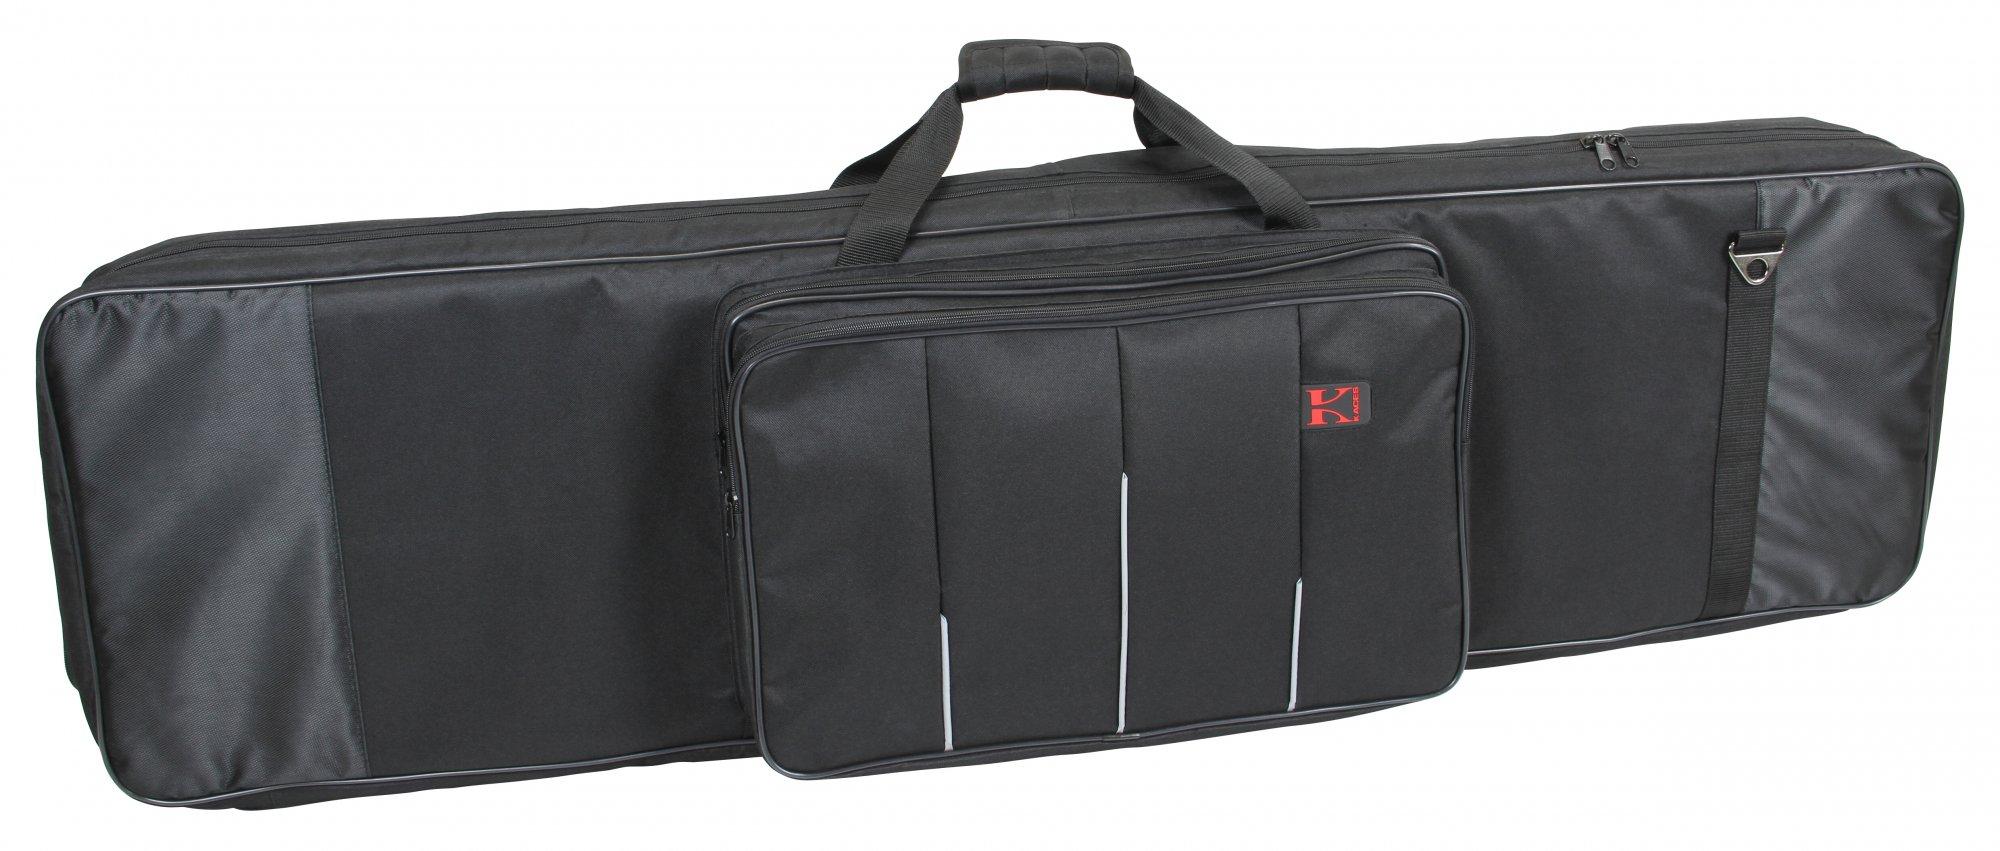 Kaces 76 Note Keyboard Bag